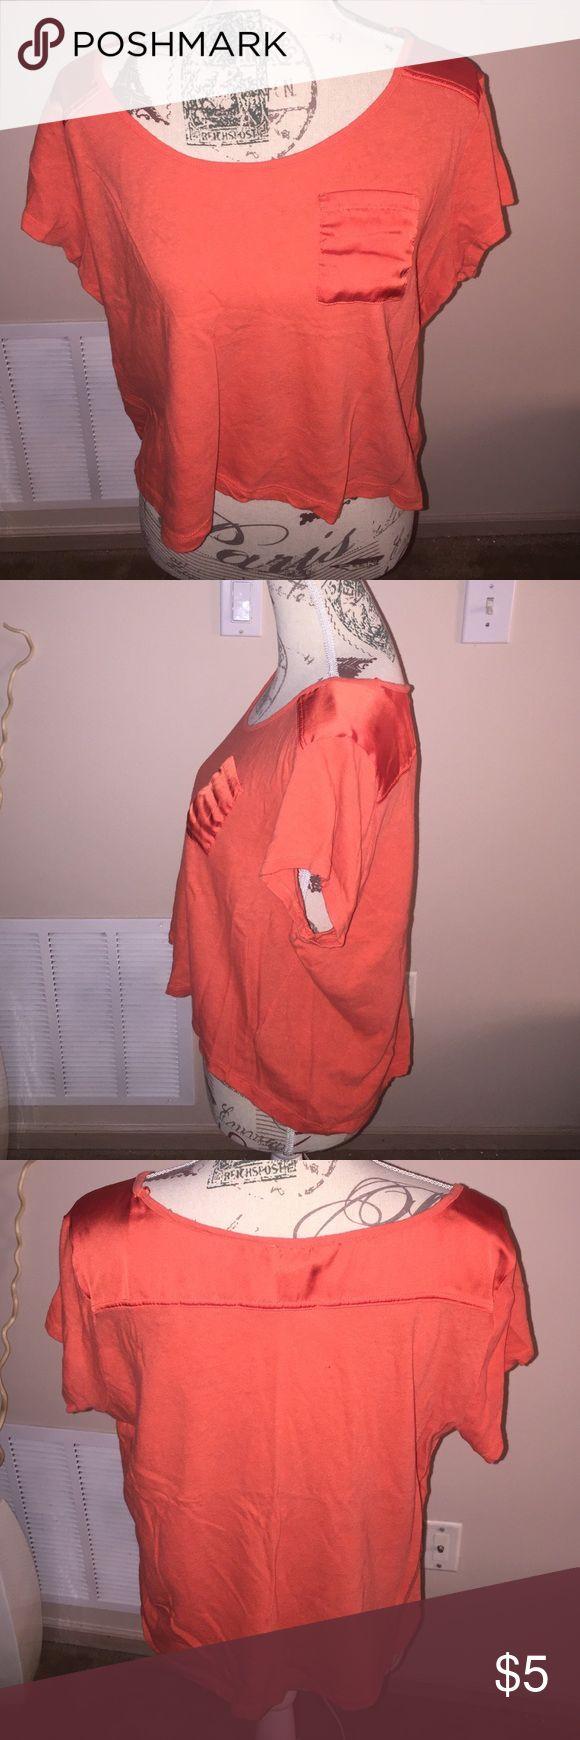 H & M tshirt size large Orange large H & M tshirt. h & m  Tops Tees - Short Sleeve